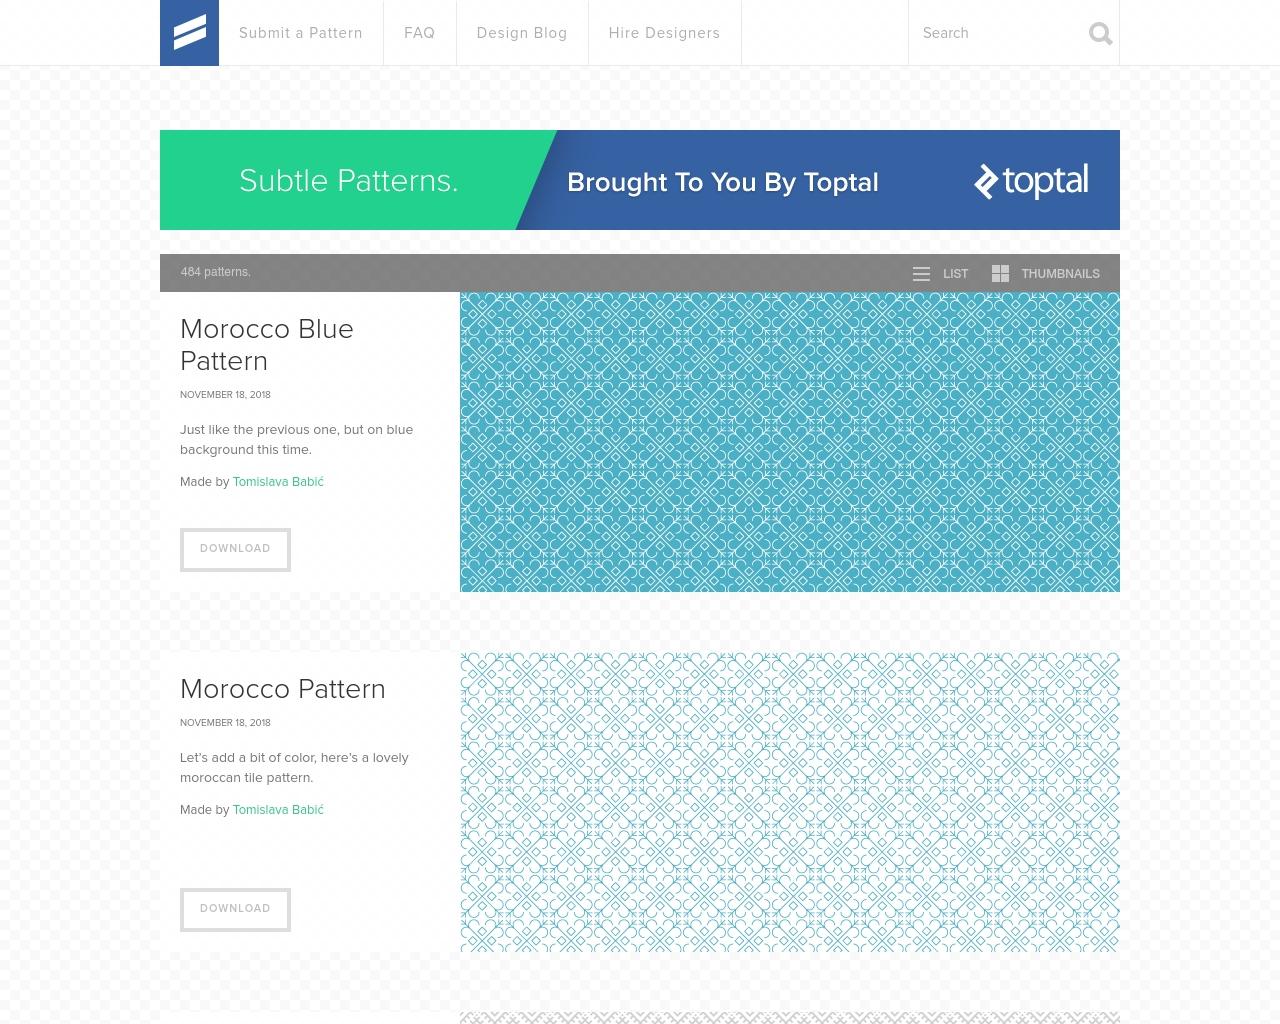 Subtle Patterns Screenshot 0